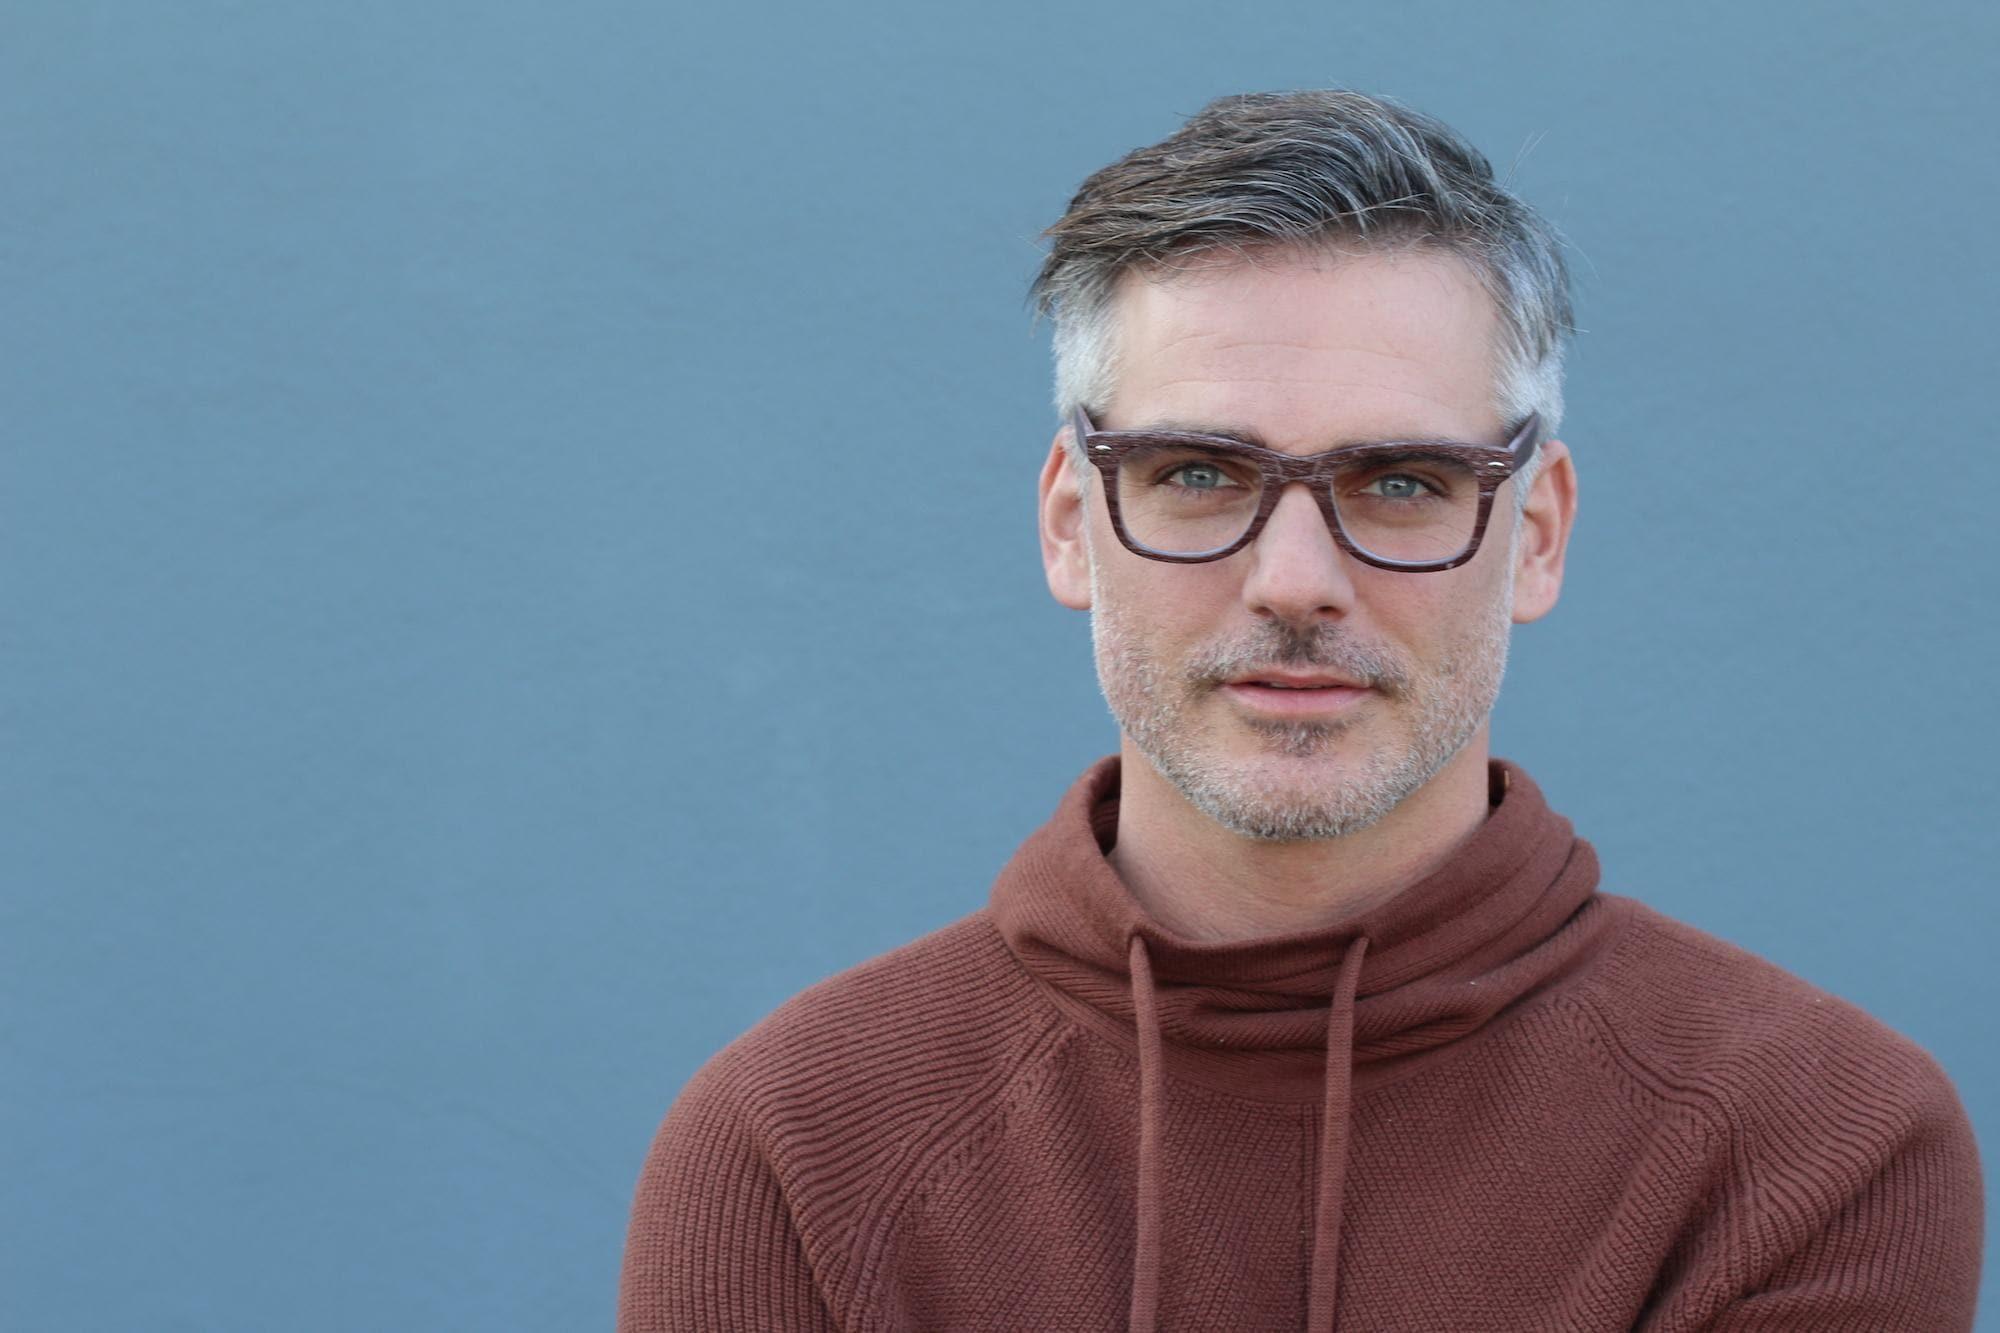 Trend warna rambut pria 2018 warna rambut alami.